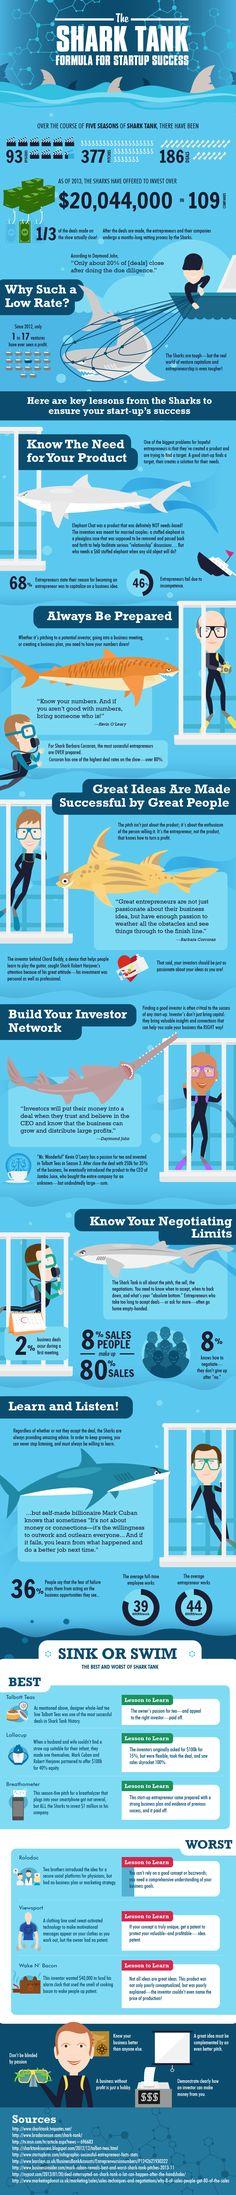 the Shark Tank formula for start-up success  http://blog.up.co/2014/08/29/shark-tank-formula-startup-success-infographic/